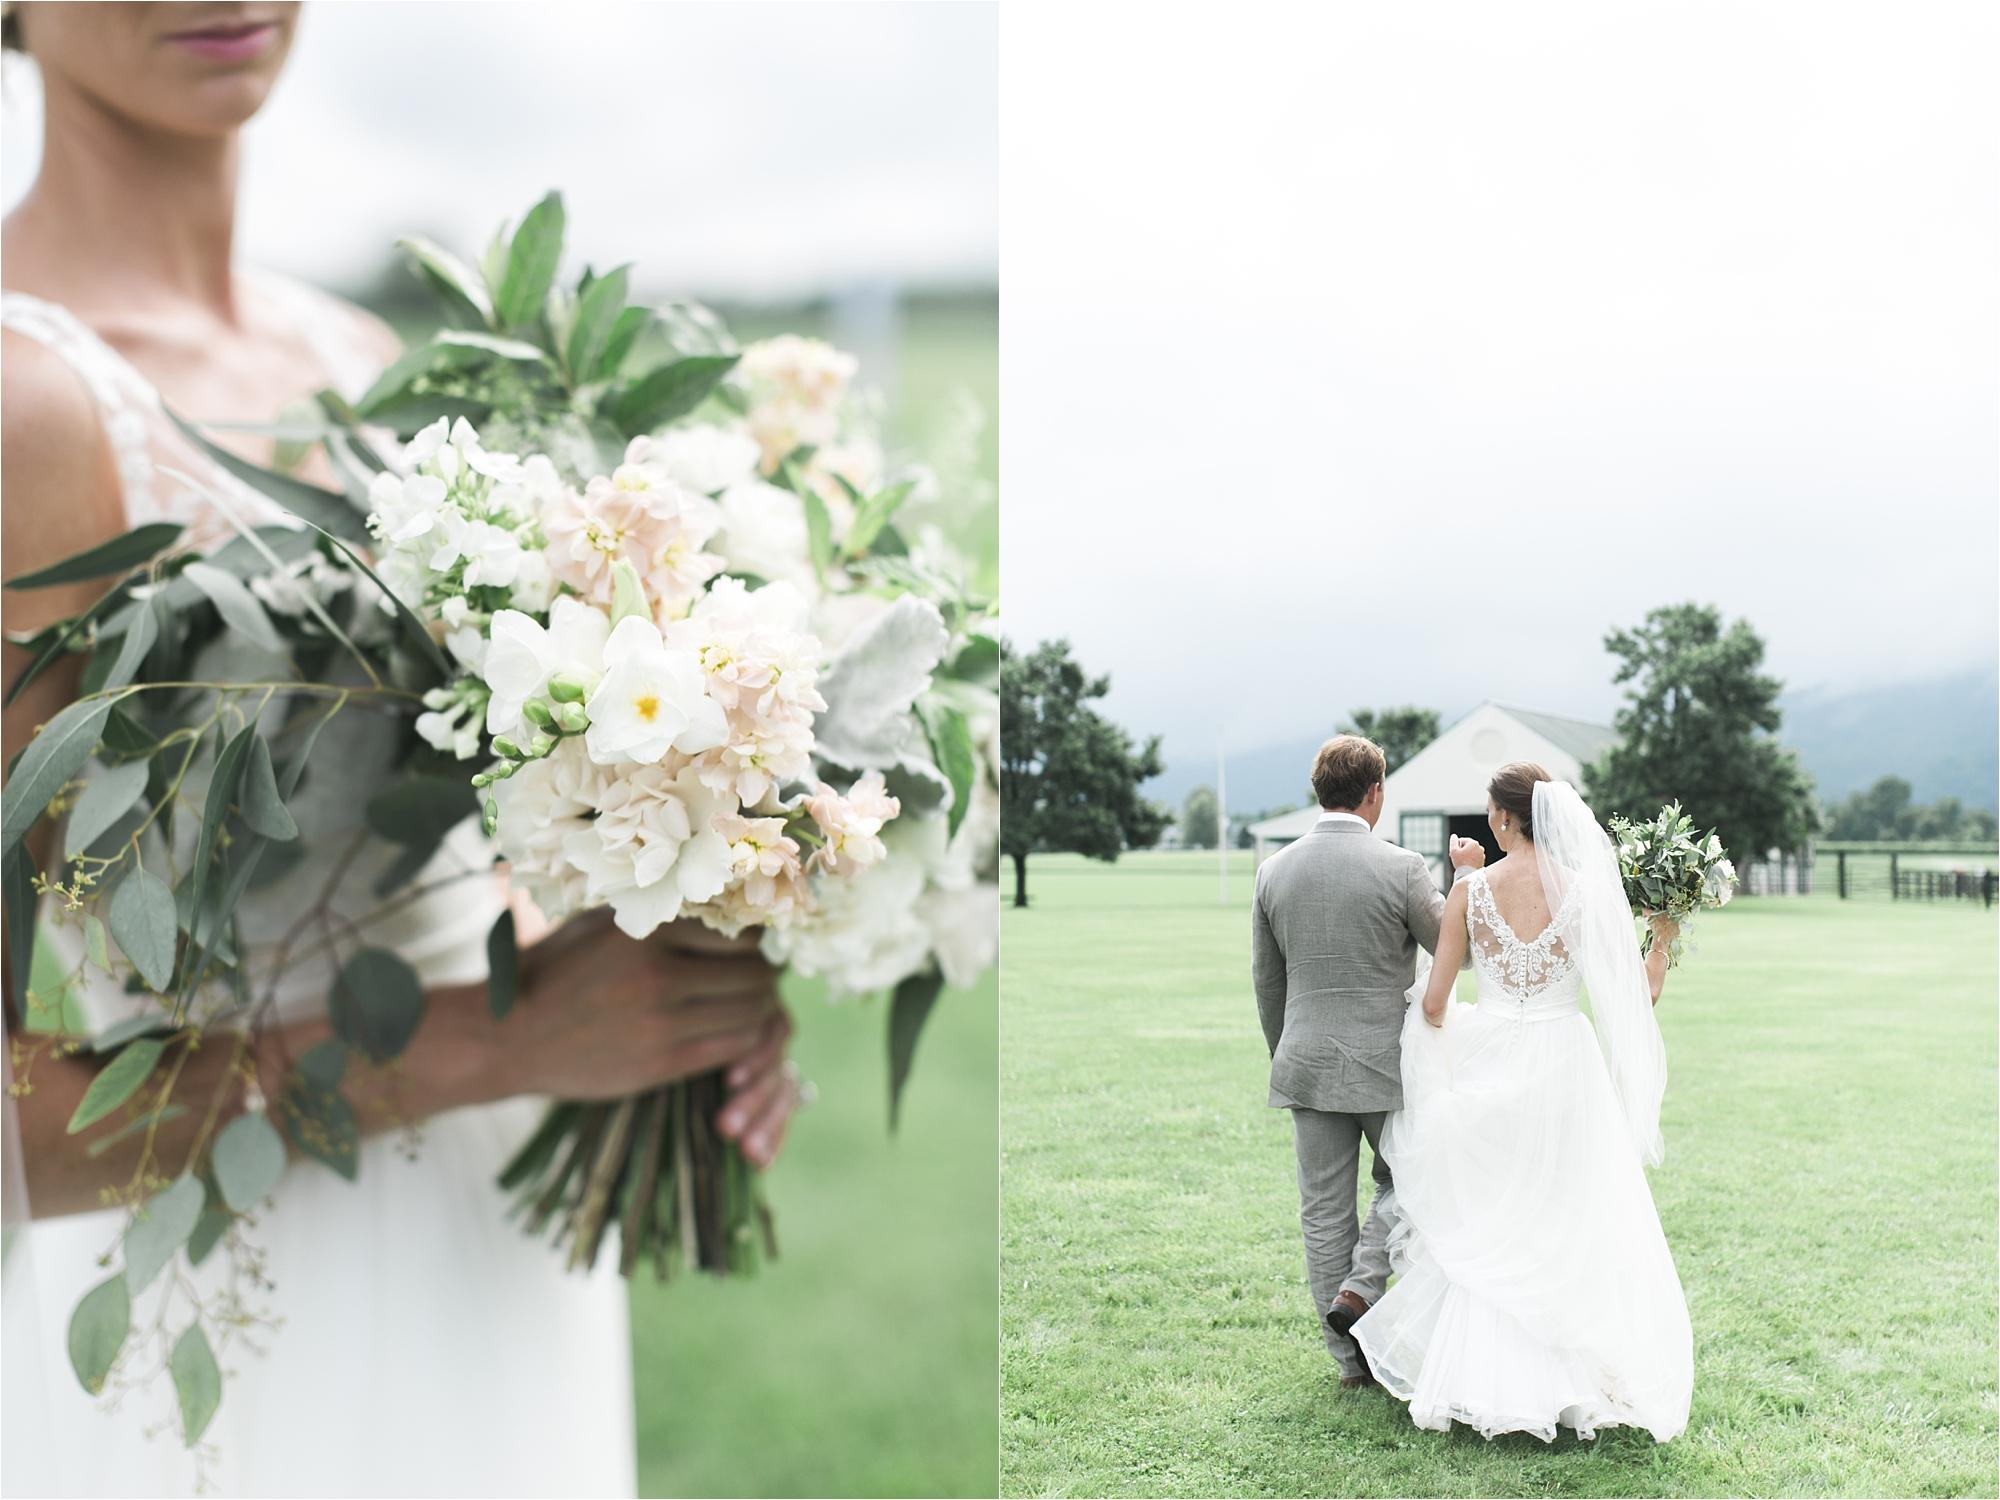 stephanie-yonce-charlottesville-virginia-king-family-vineyard-wedding-photos_0012.jpg